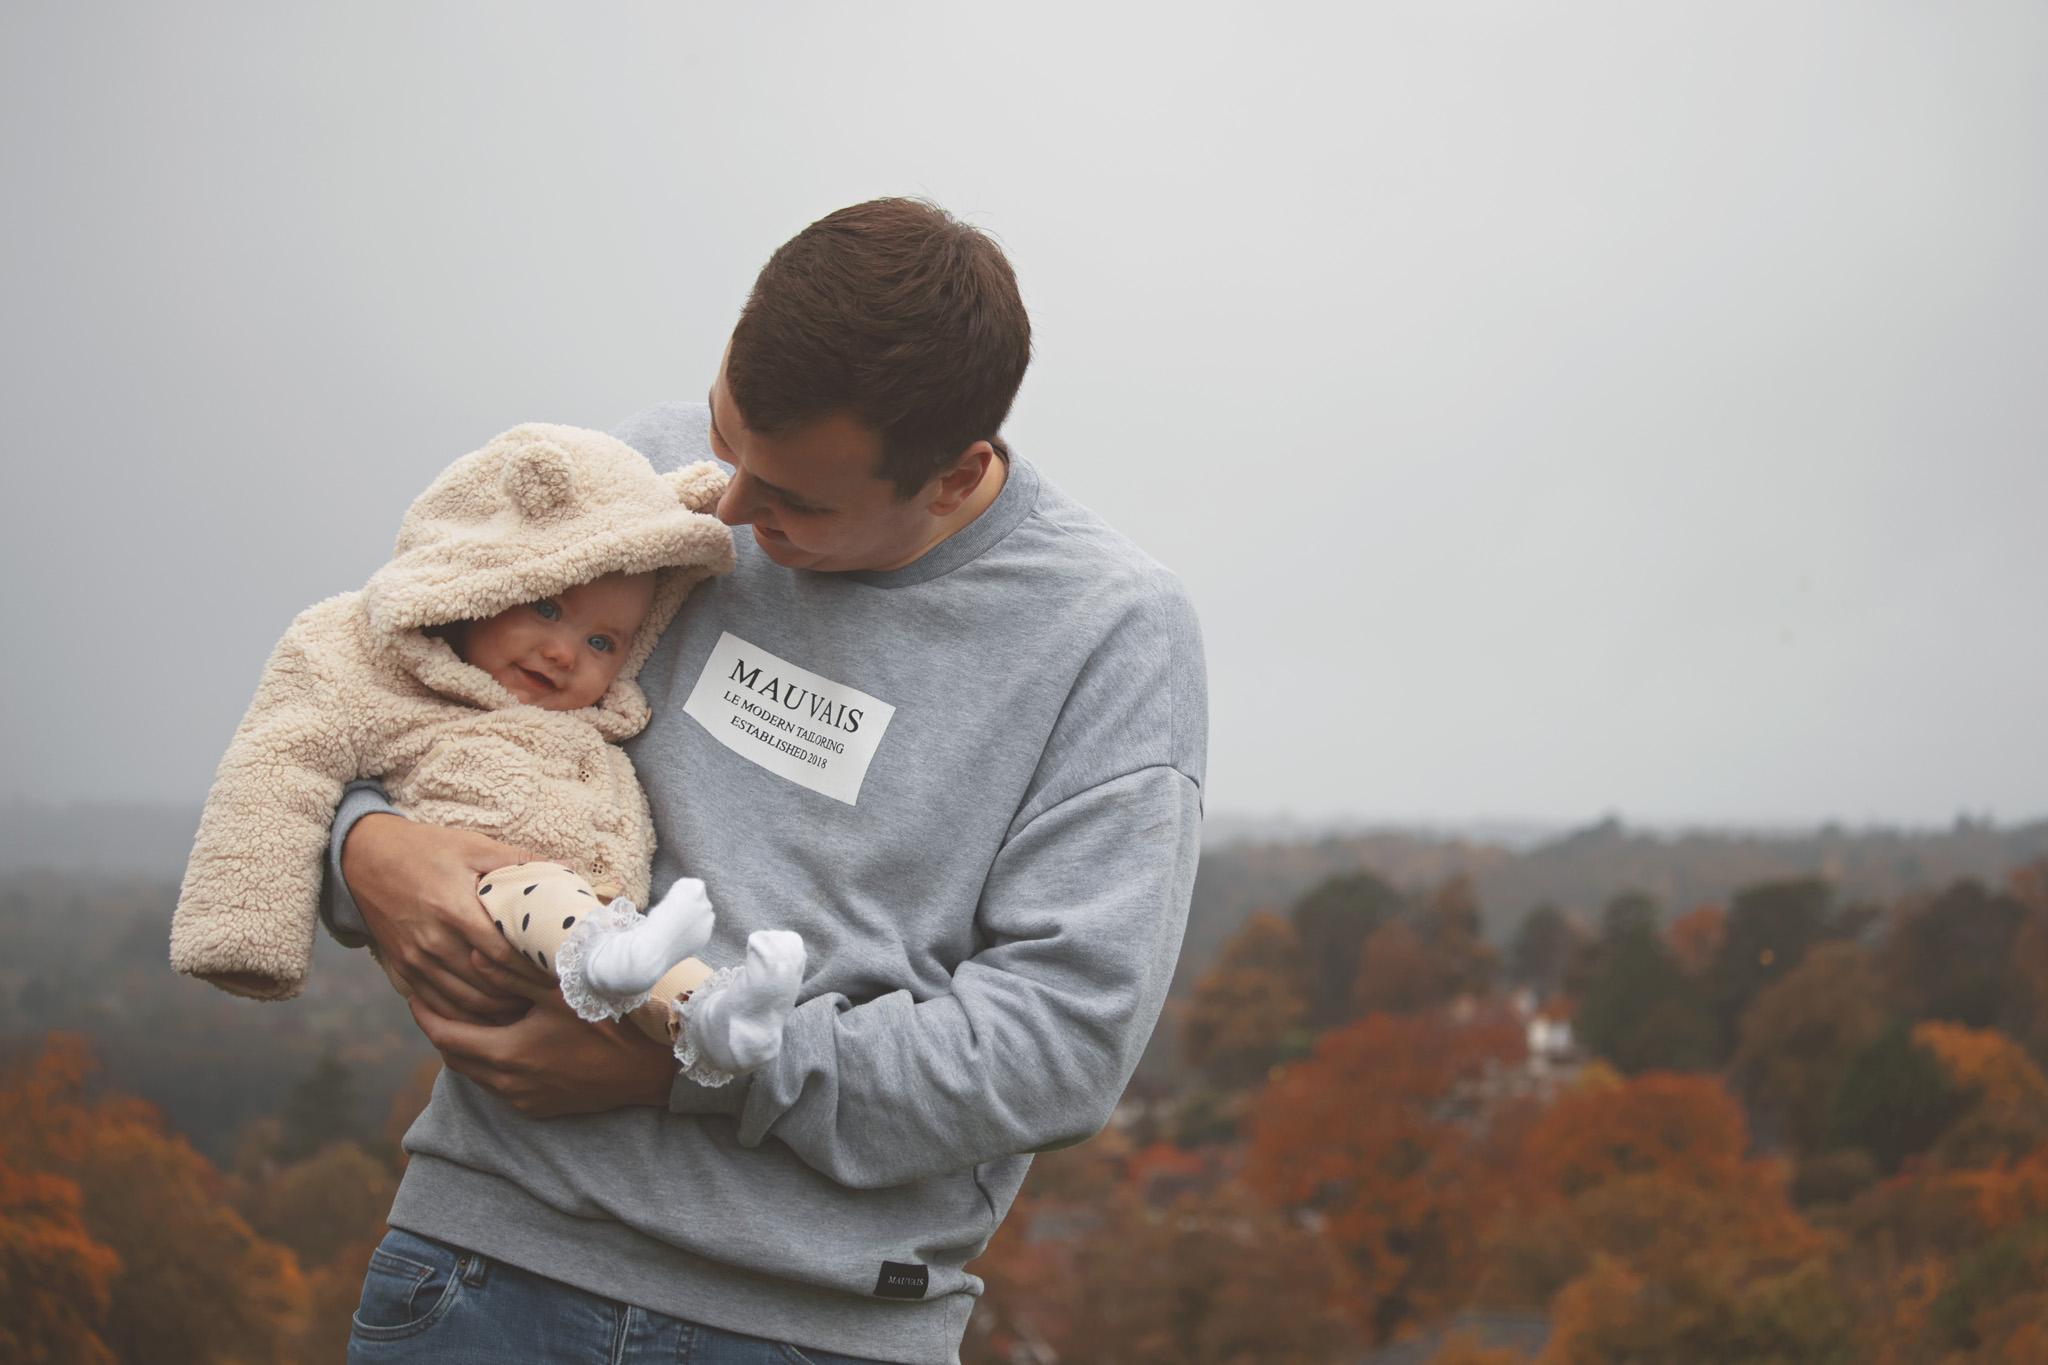 Son & Daughter Family Portrait